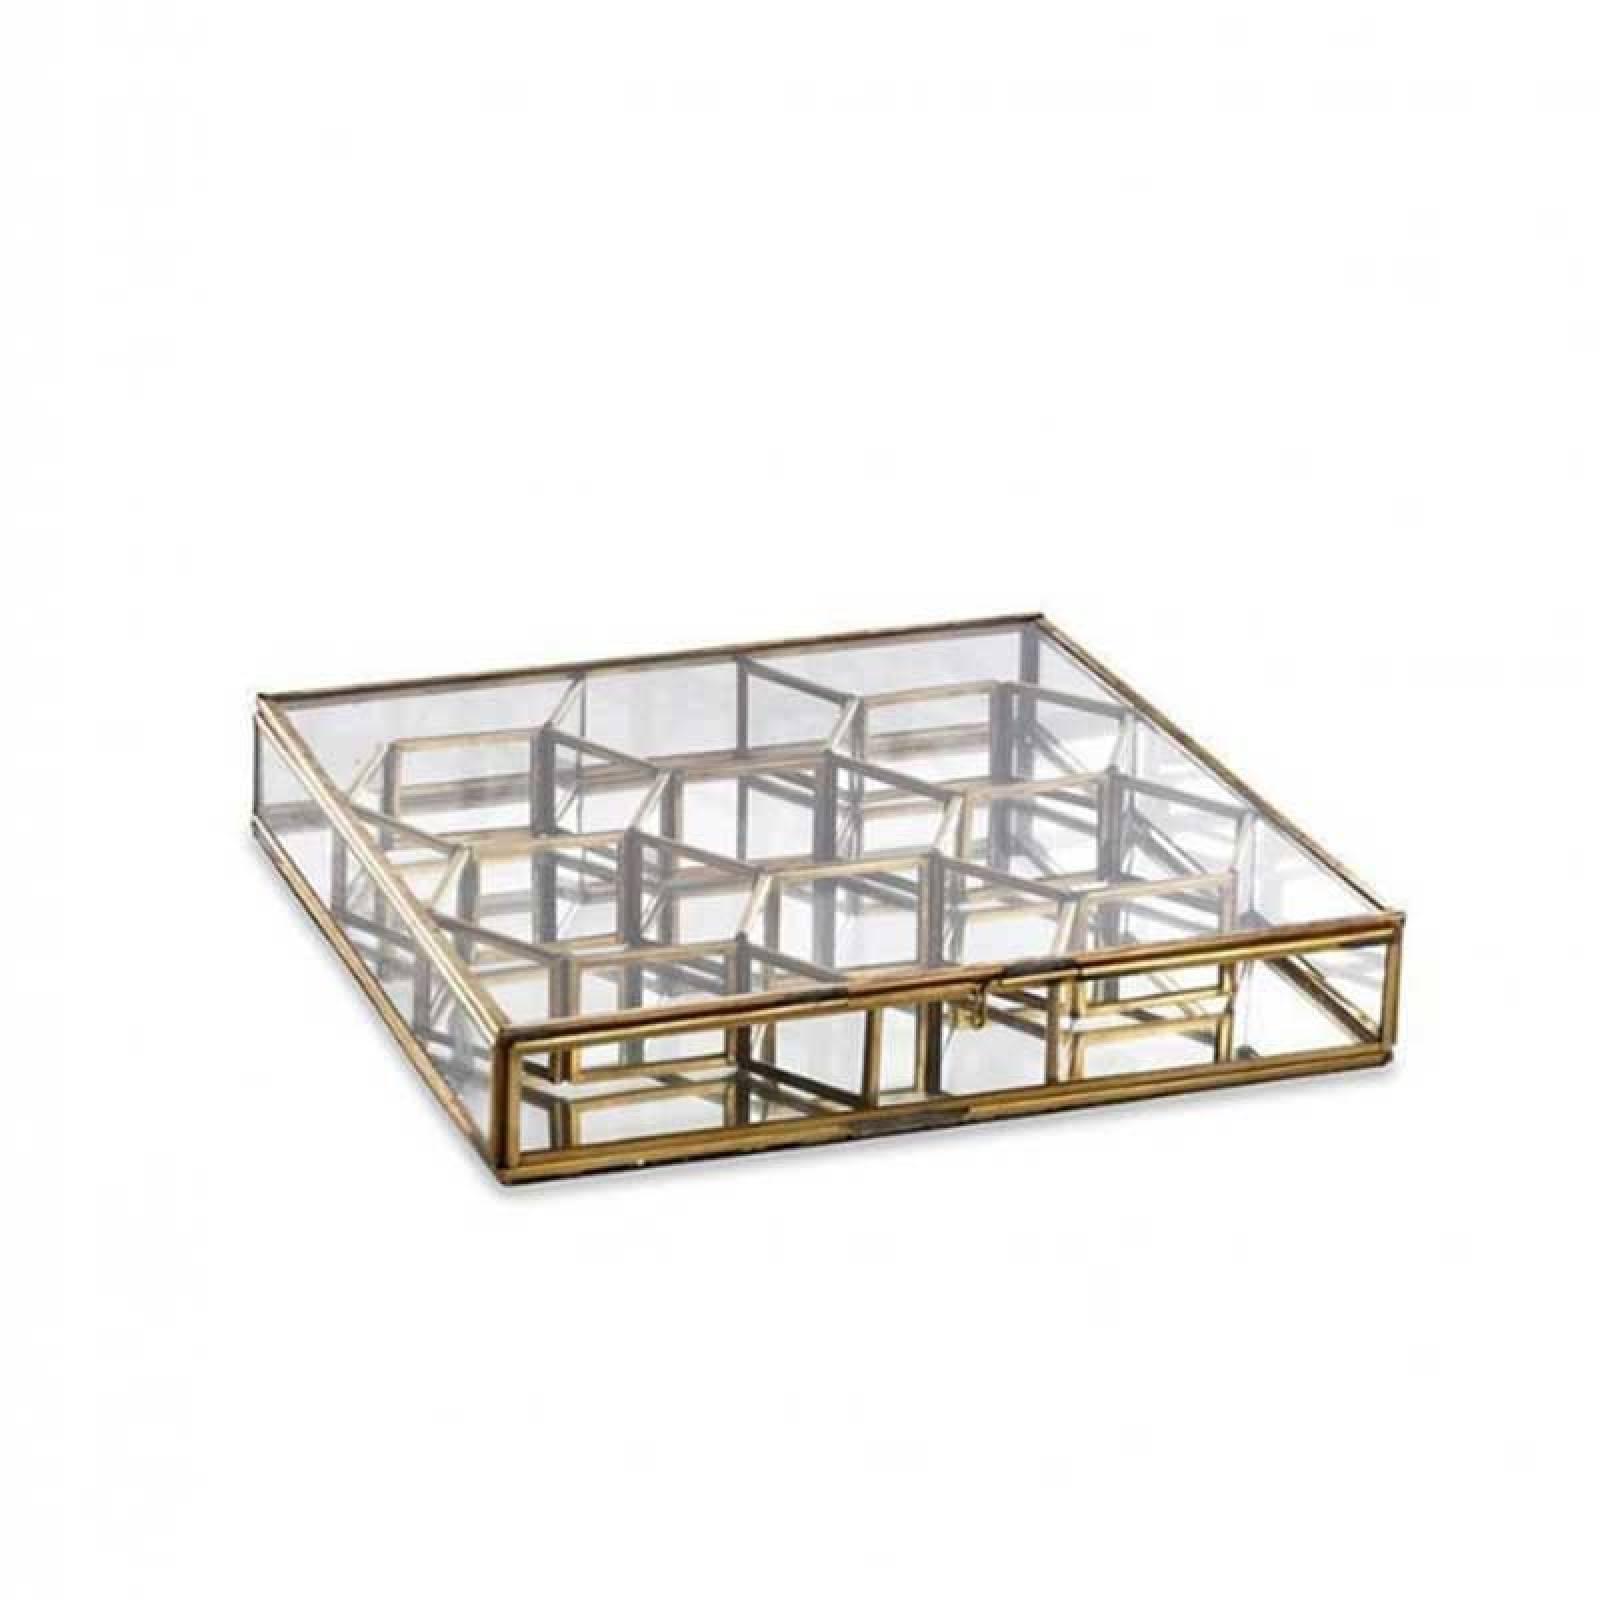 Bequai Glass And Brass Honeycomb Box thumbnails